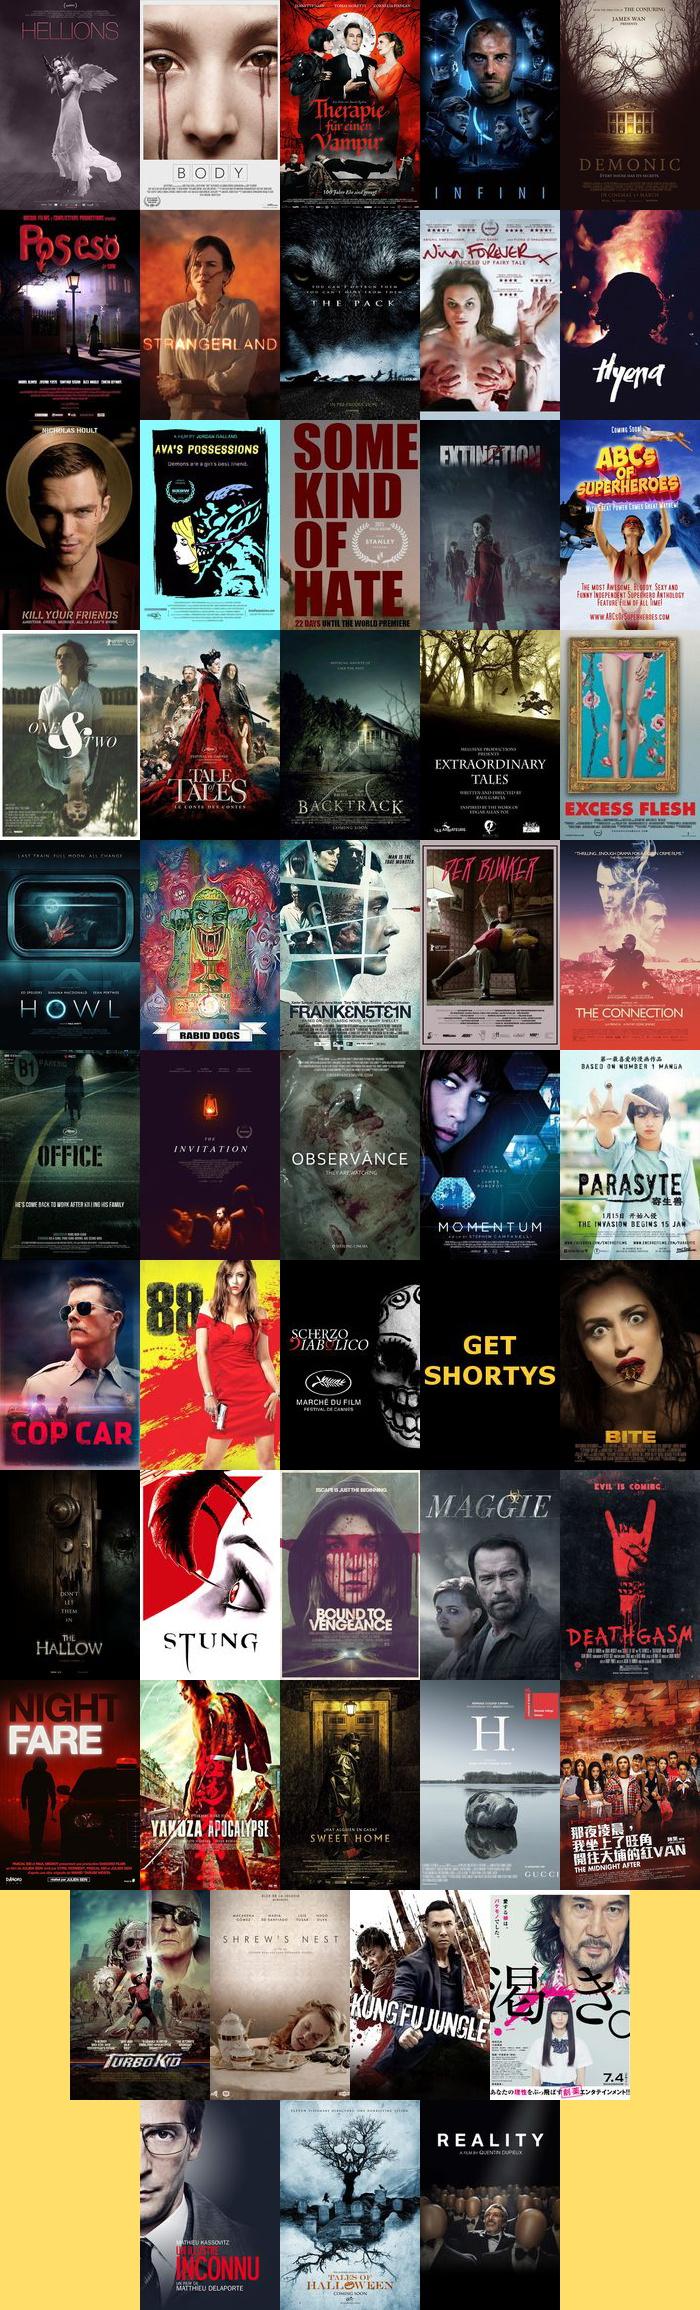 Fantasy Filmfest 2015 - Fantasy Filmfest 2015 - Tag #14